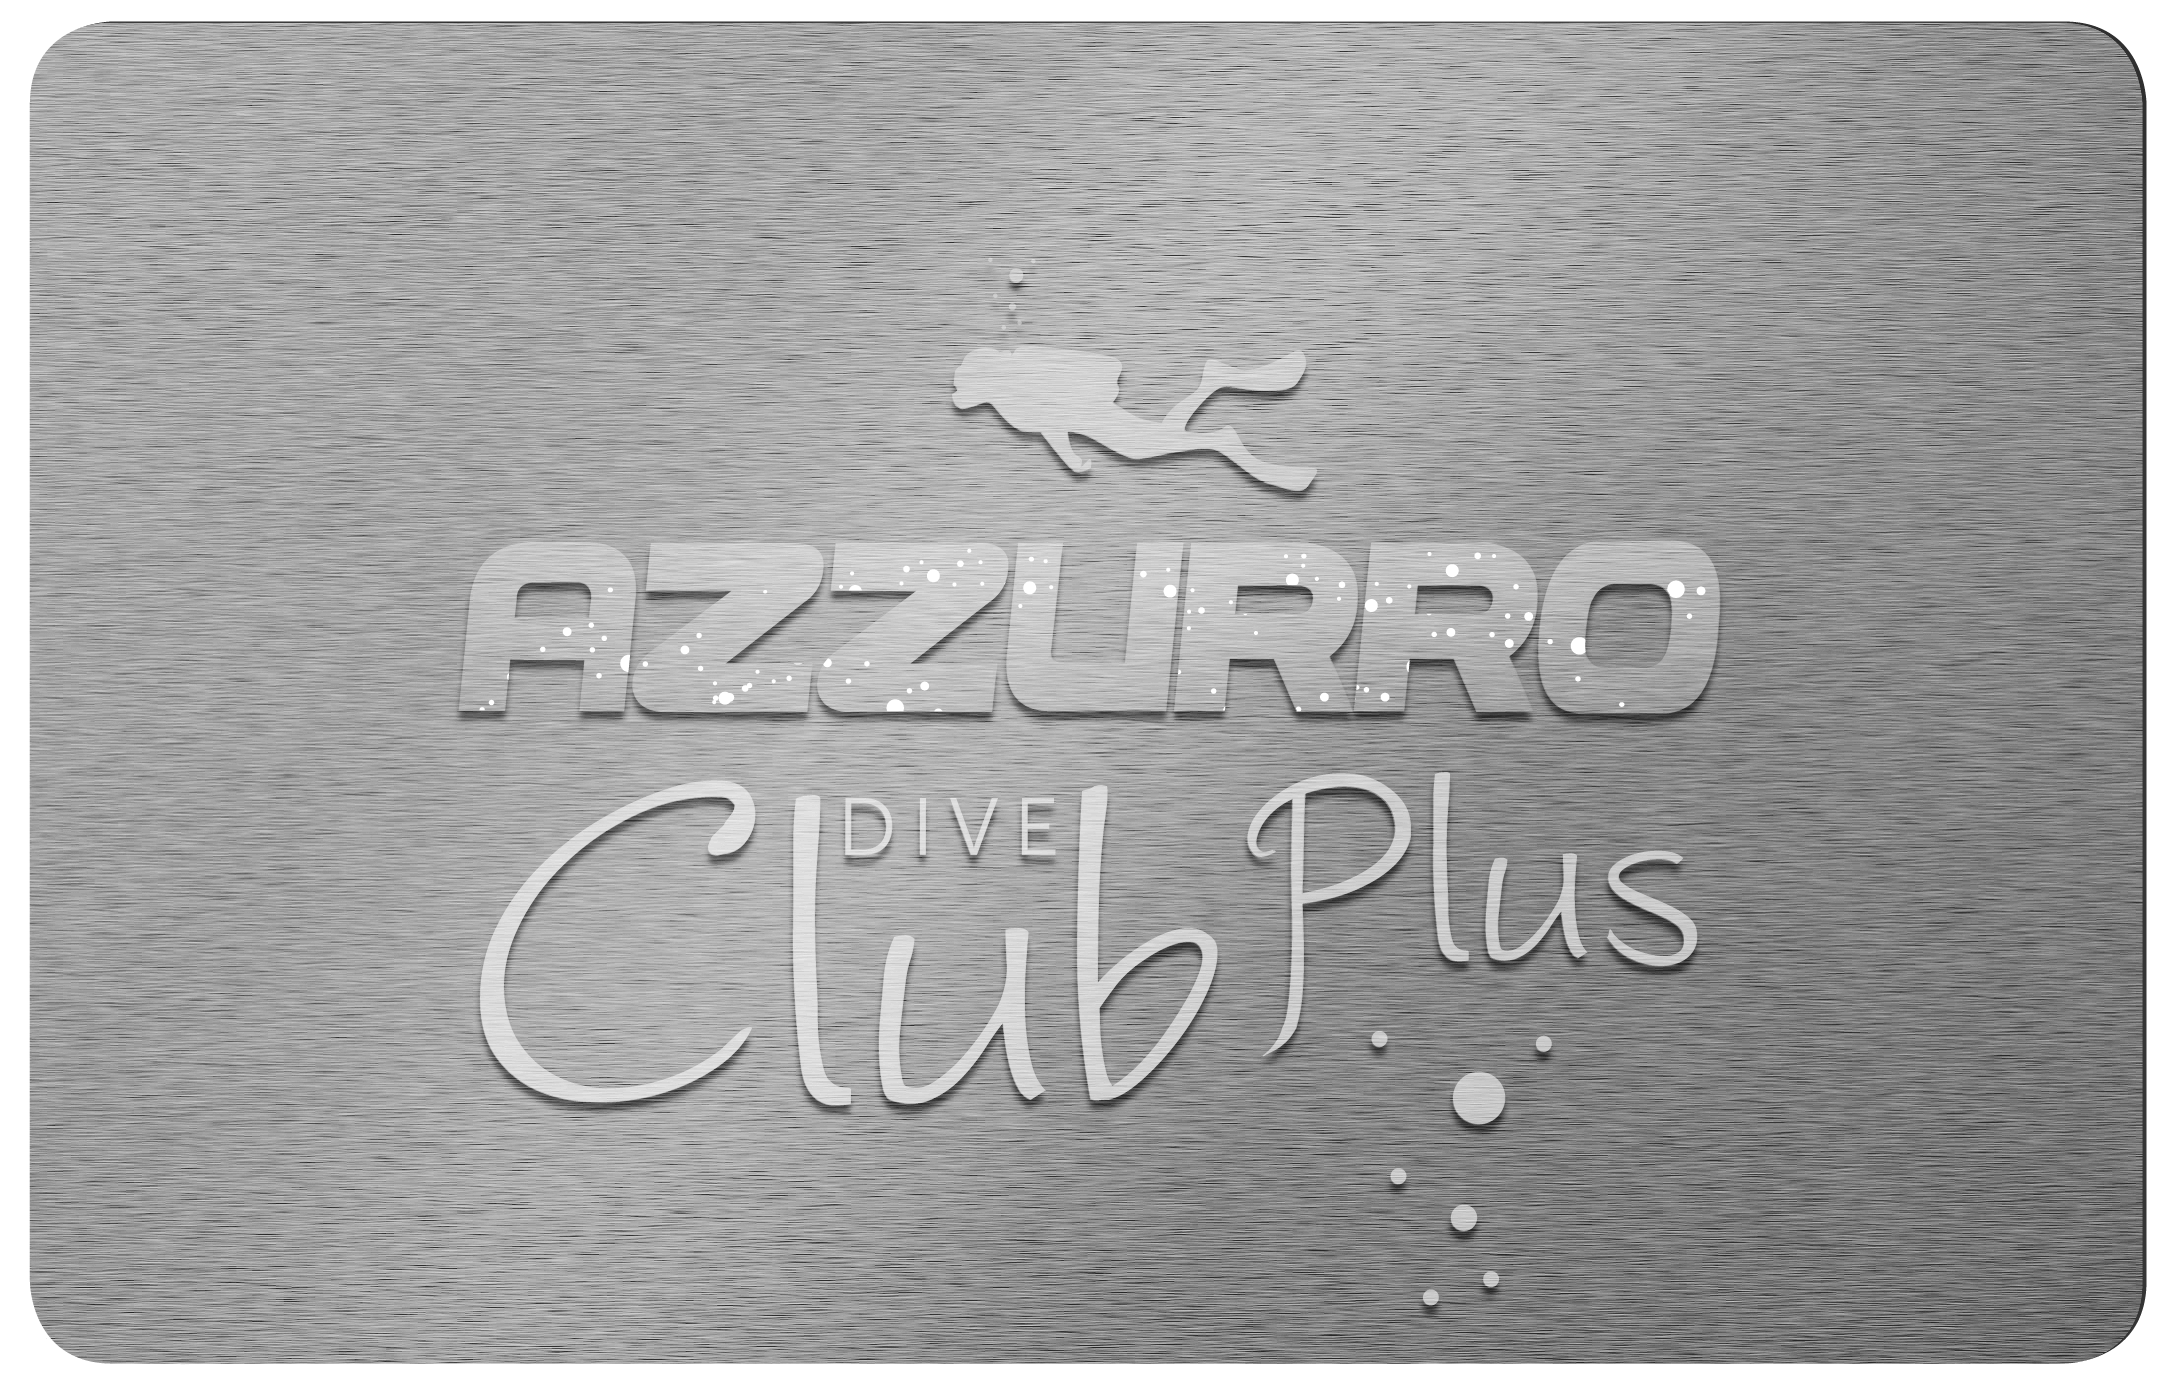 Azzurro Dive Club - PLUS